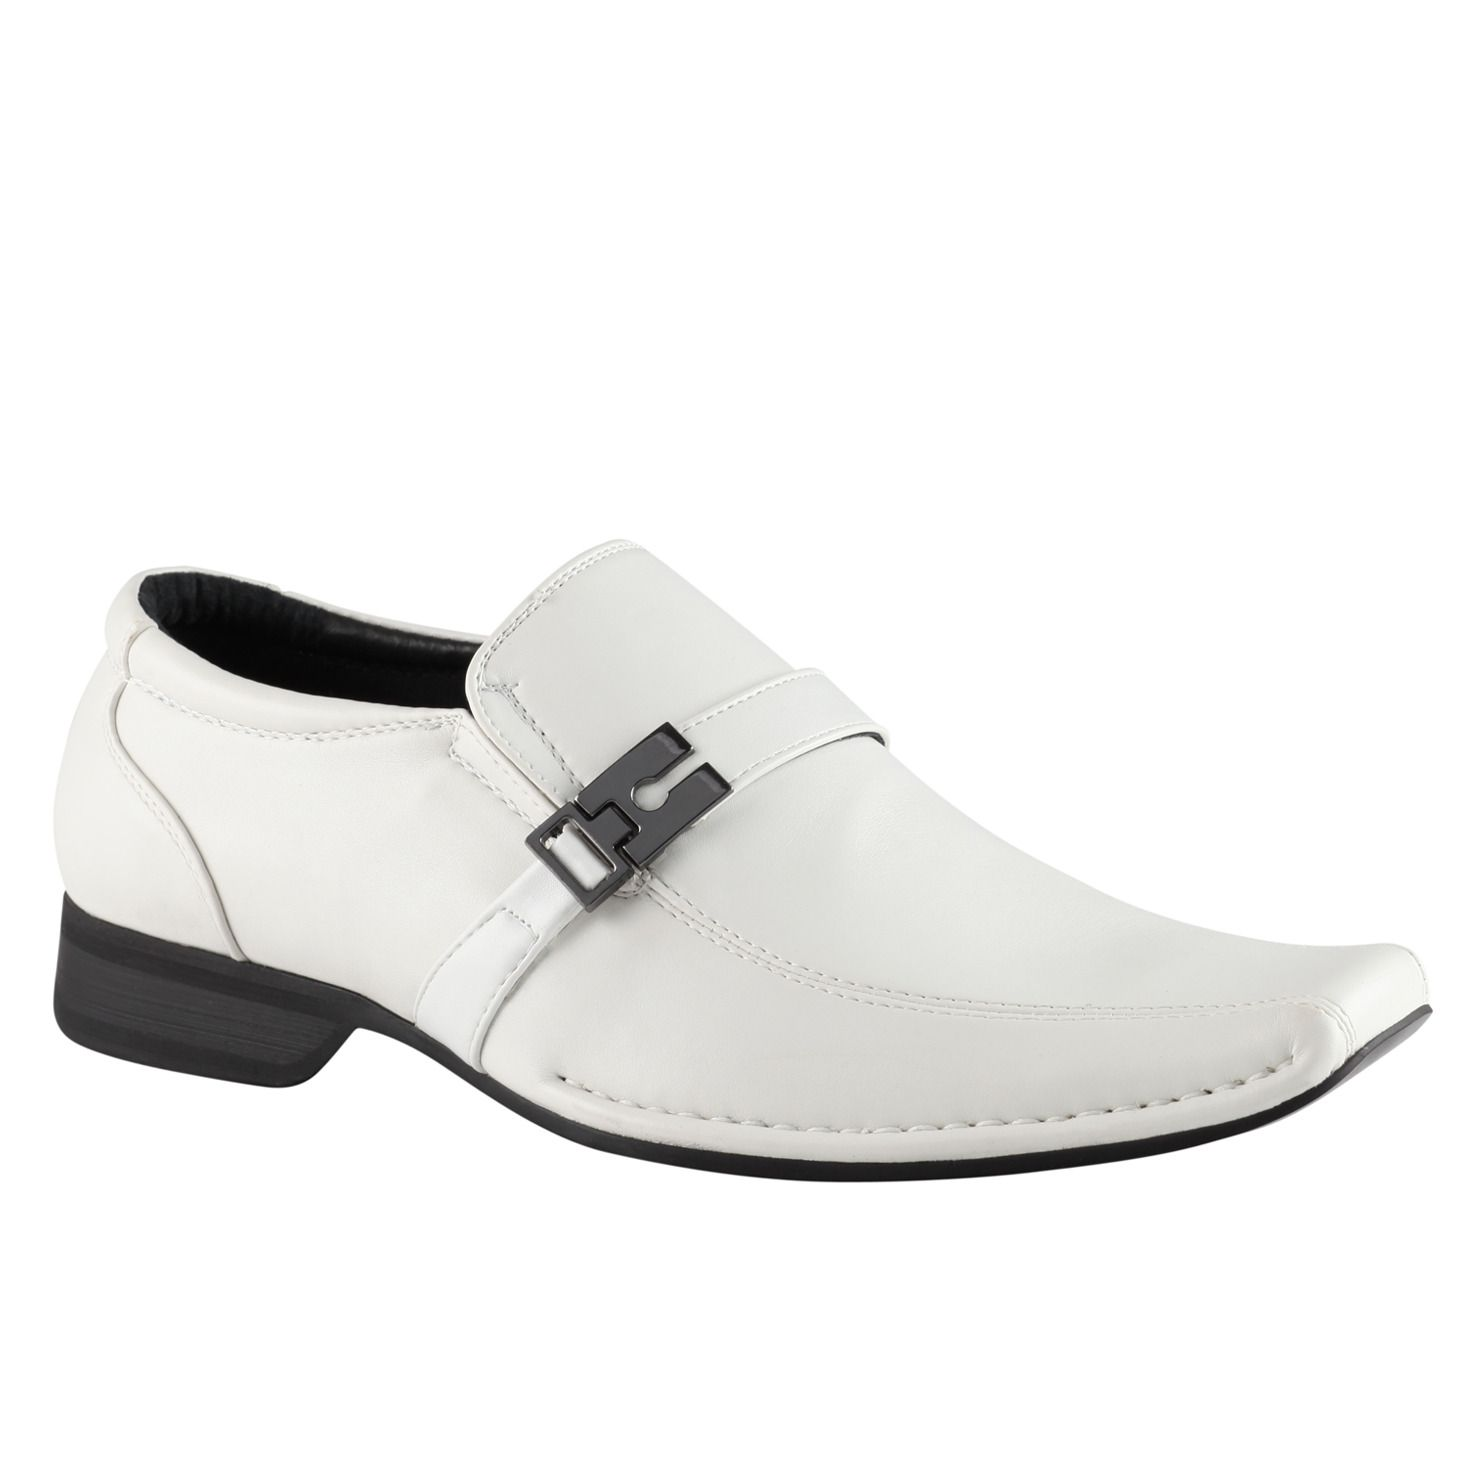 Aldo shoes men black dress